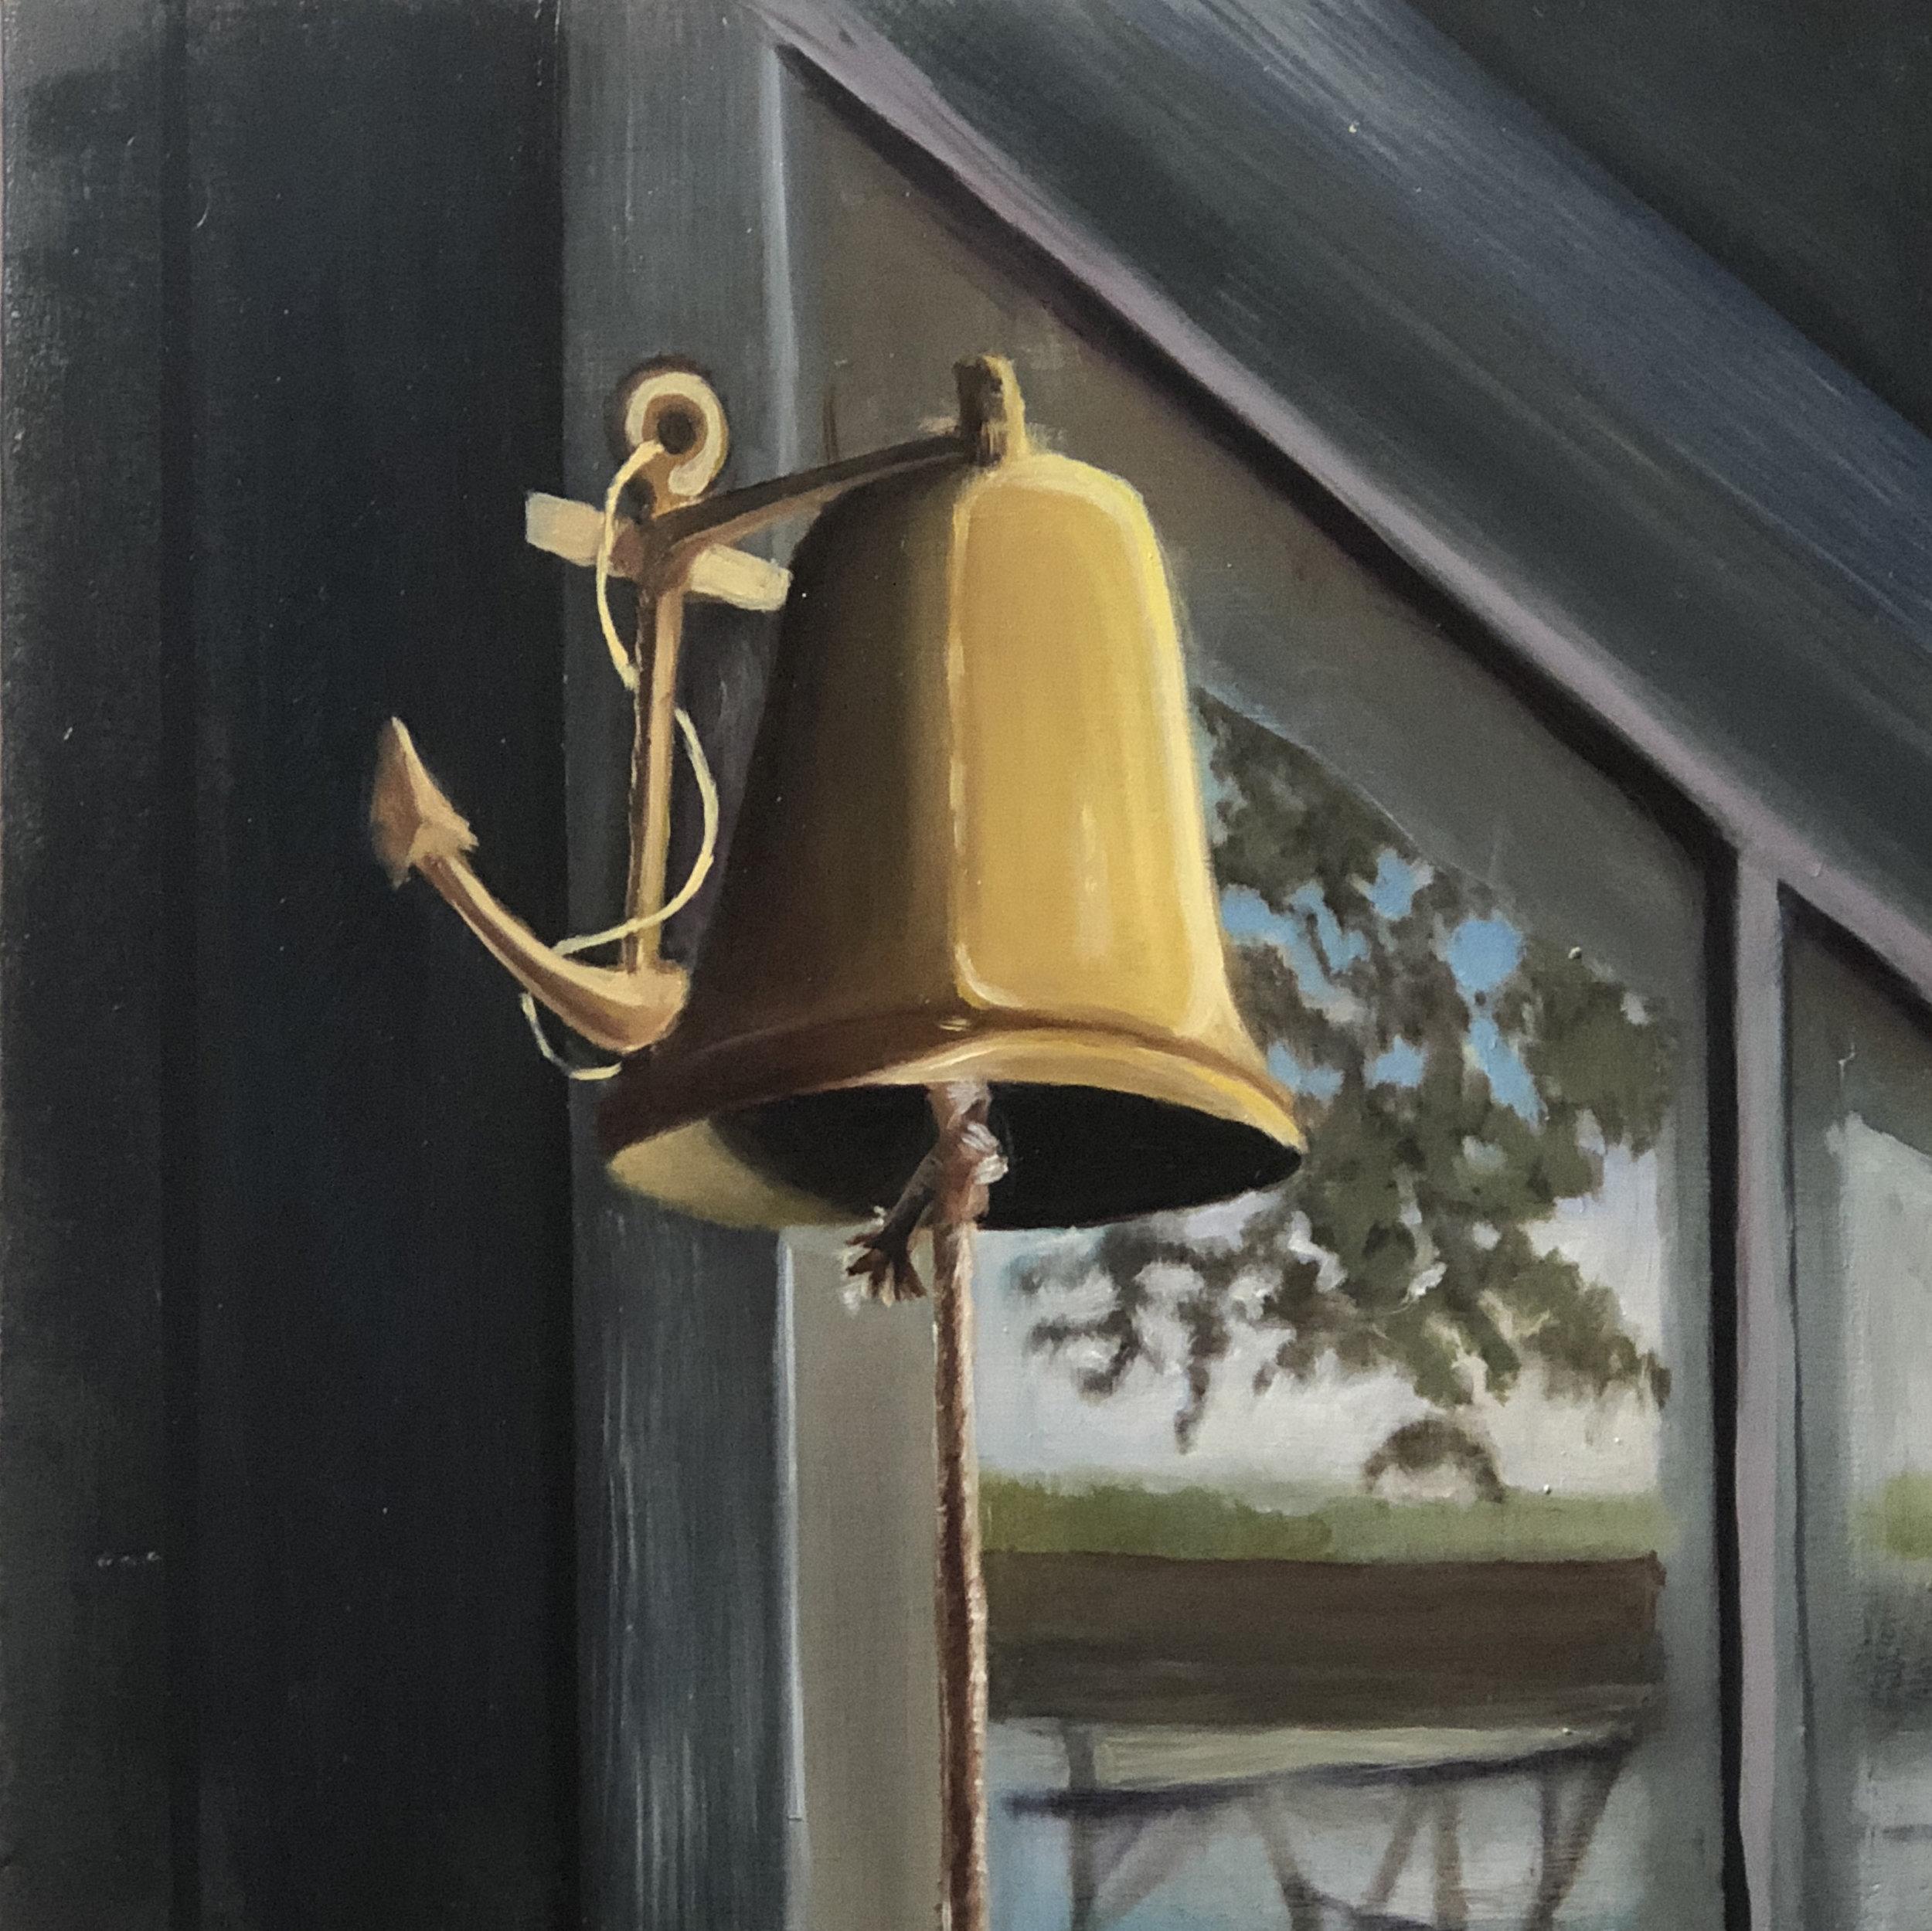 Dennis-Crayon-Dinner-Bell-8x8-oil-on-Panel.jpg